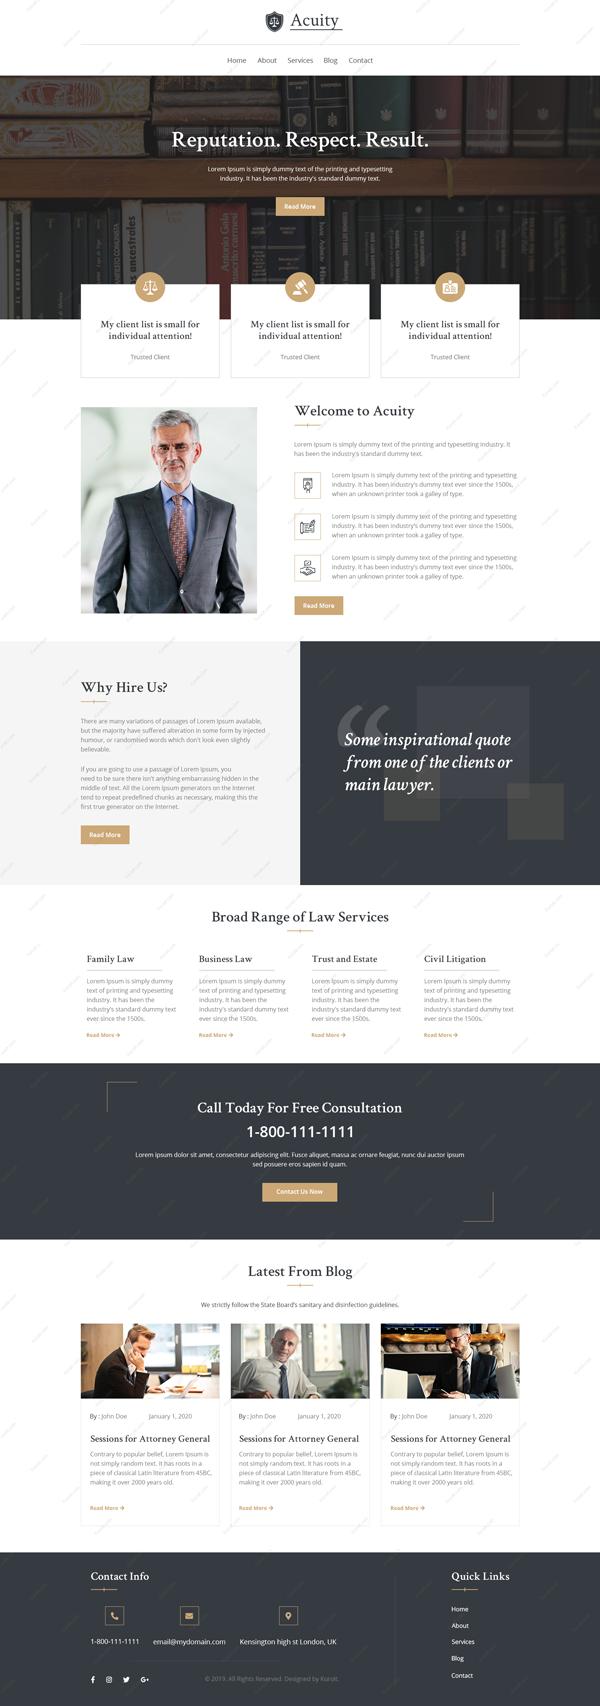 Acuity-Website-Design